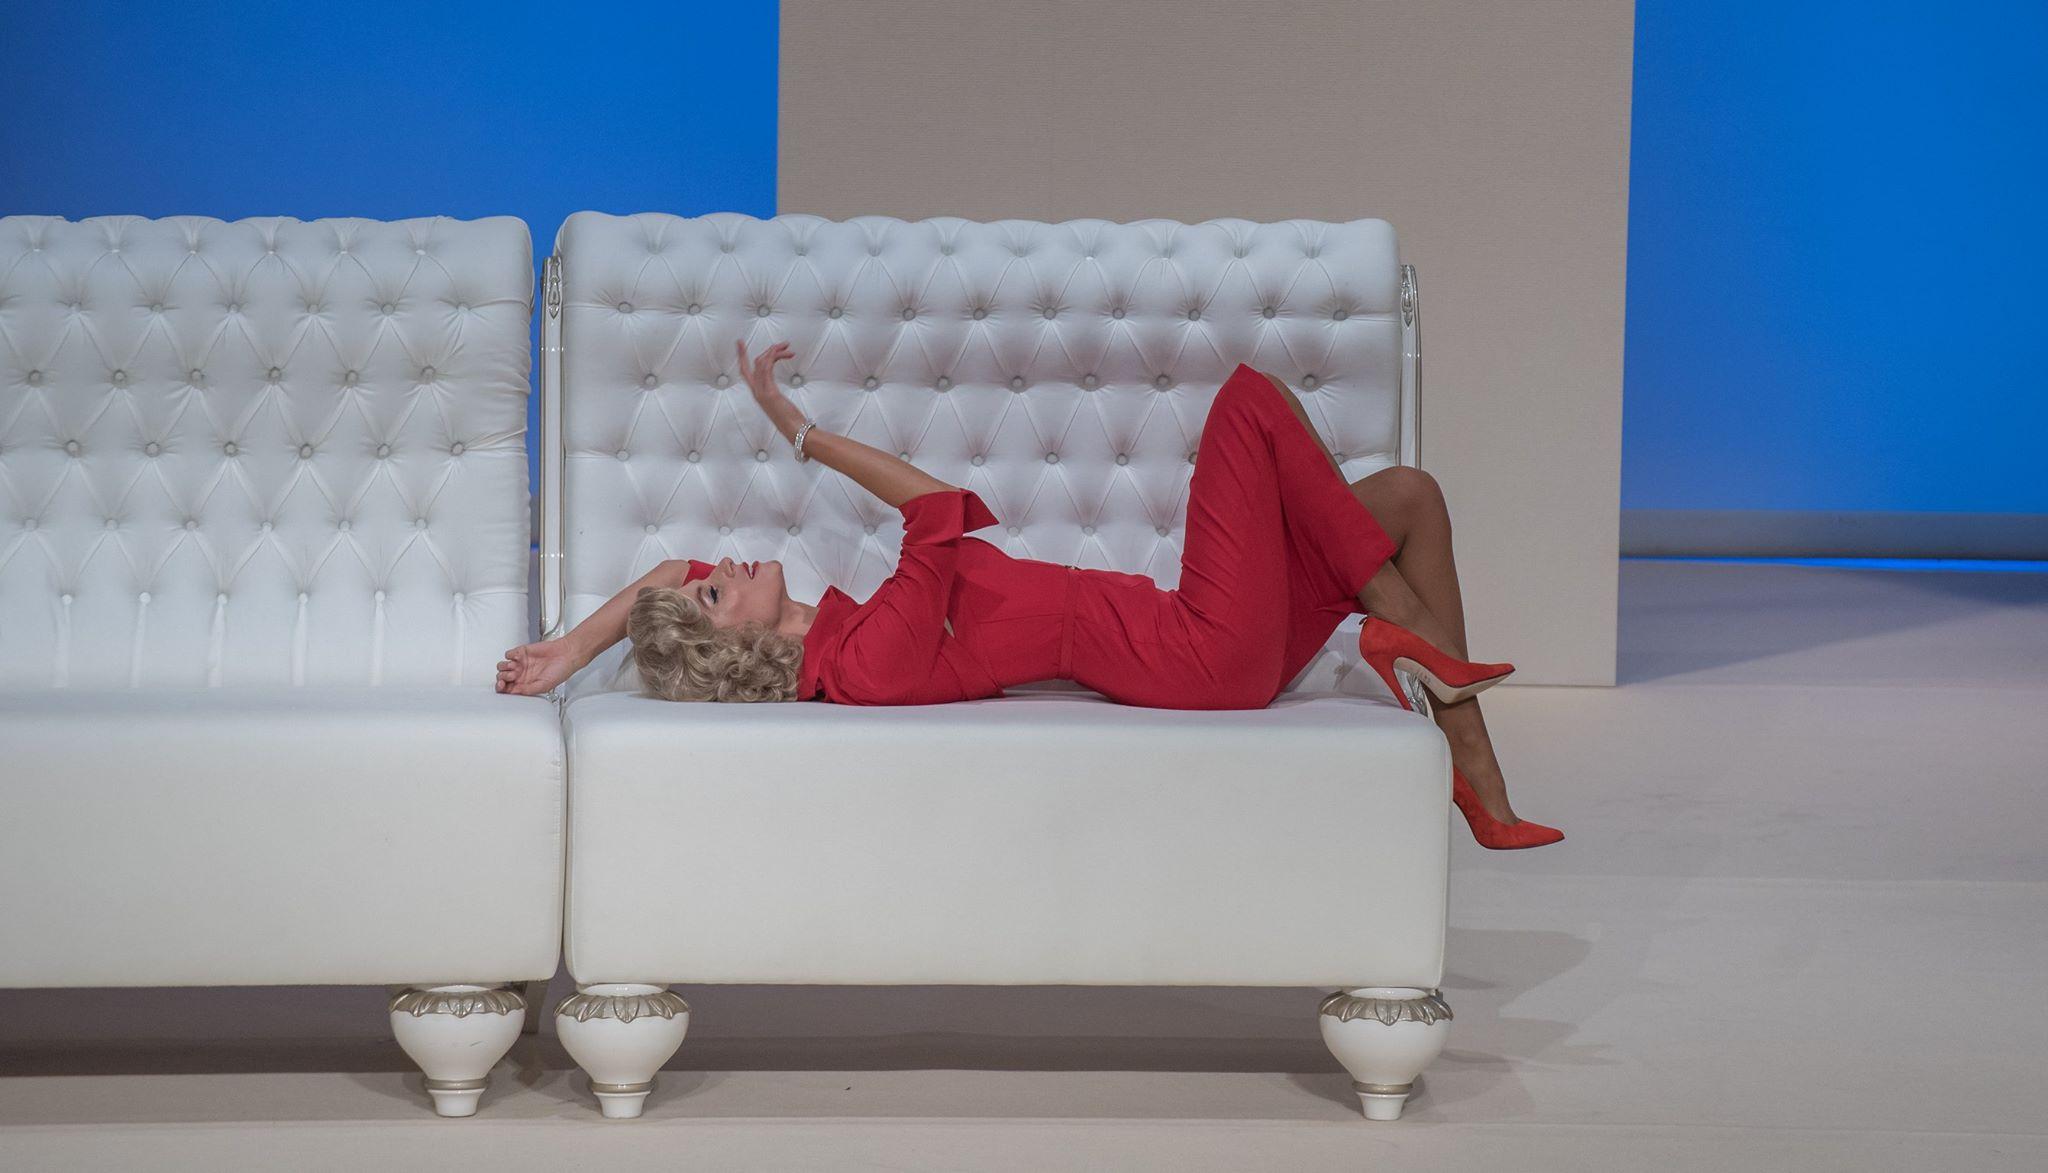 "<span  class=""uc_style_uc_tiles_grid_image_elementor_uc_items_attribute_title"" style=""color:#ffffff;"">Ana Paula Rocha - Teatro - A mãe biológica de Marylin Monroe - Outubro 2016 - 002</span>"